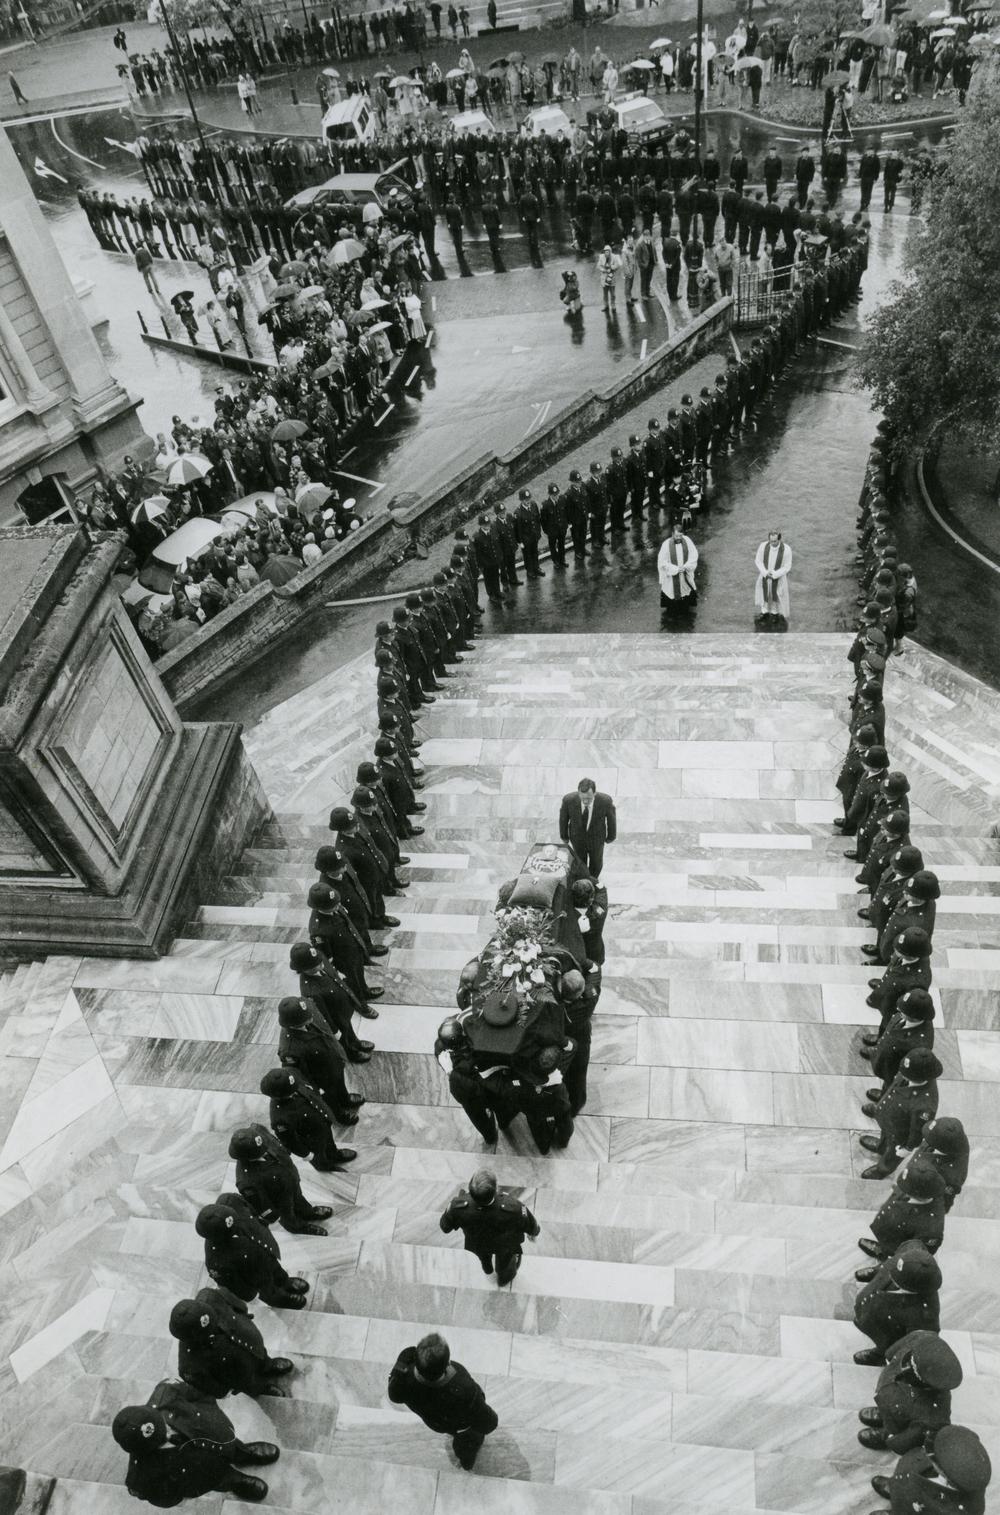 Stu Gutherie Aramoana Funeral 19 11 90.jpg